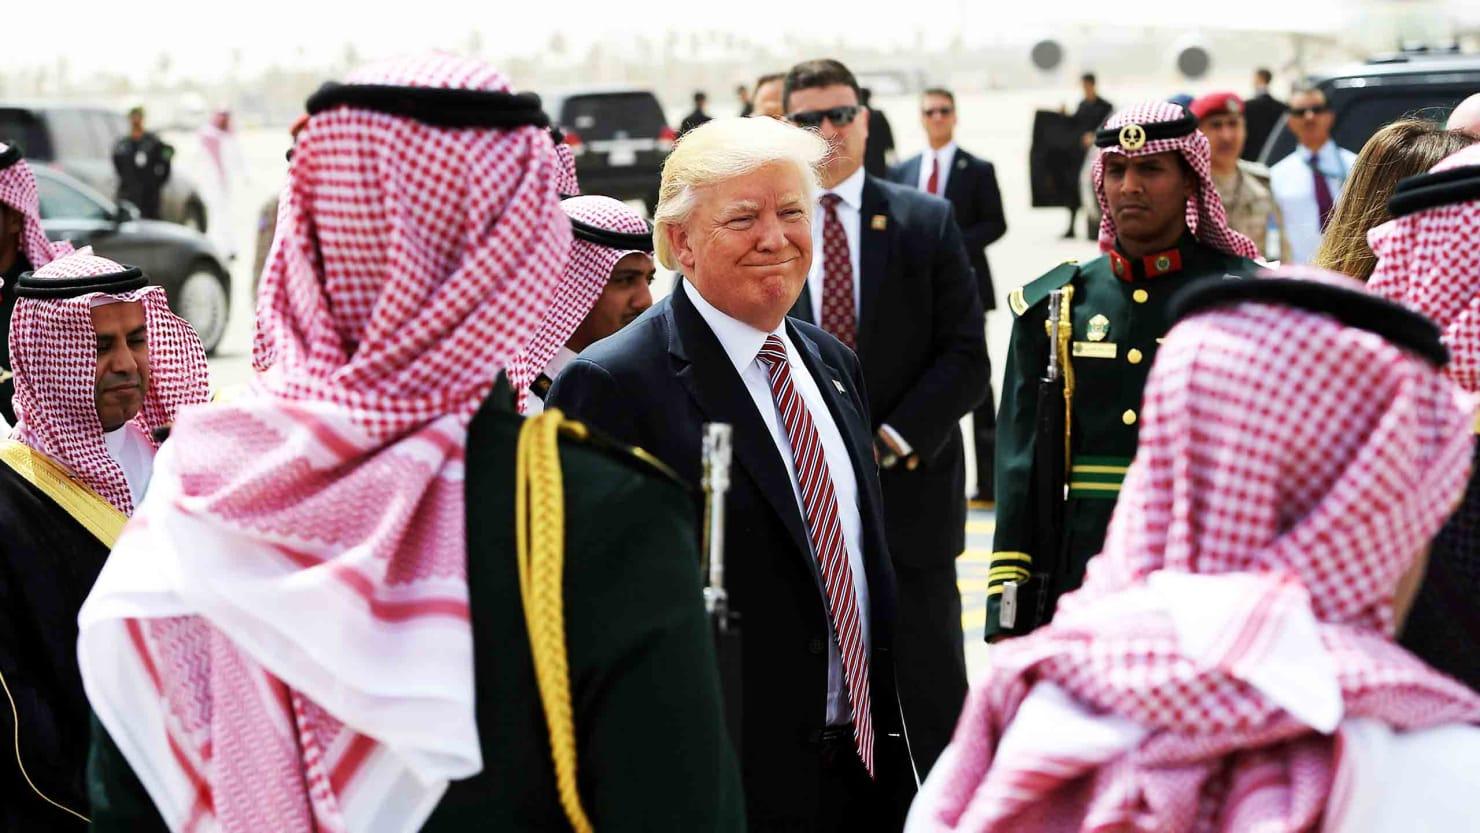 Despite Campaign Promises, Arms Shipments to Saudis Skyrocket Under Trump